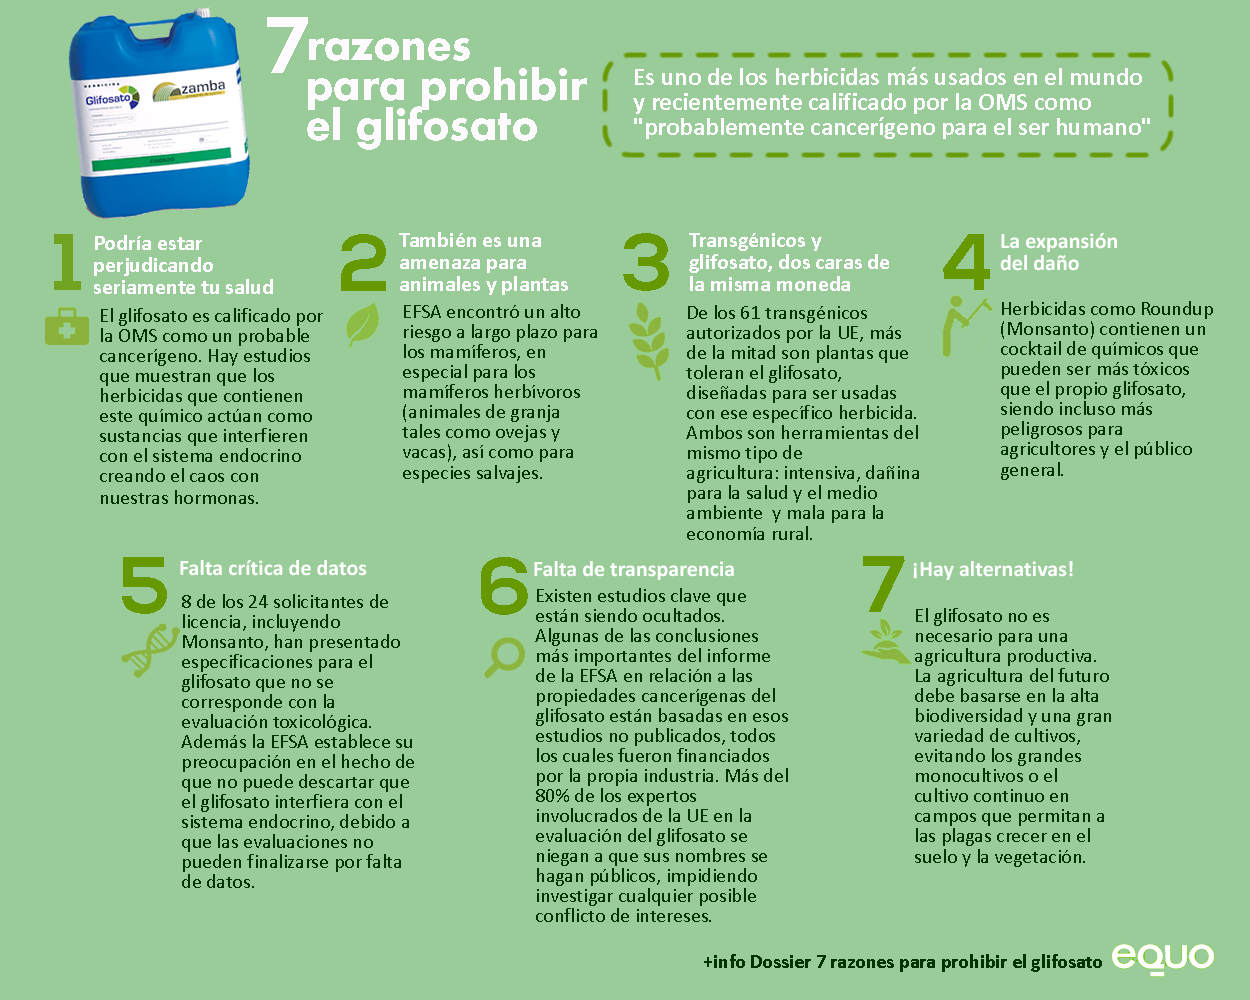 7 razones para prohibir el Glifosato